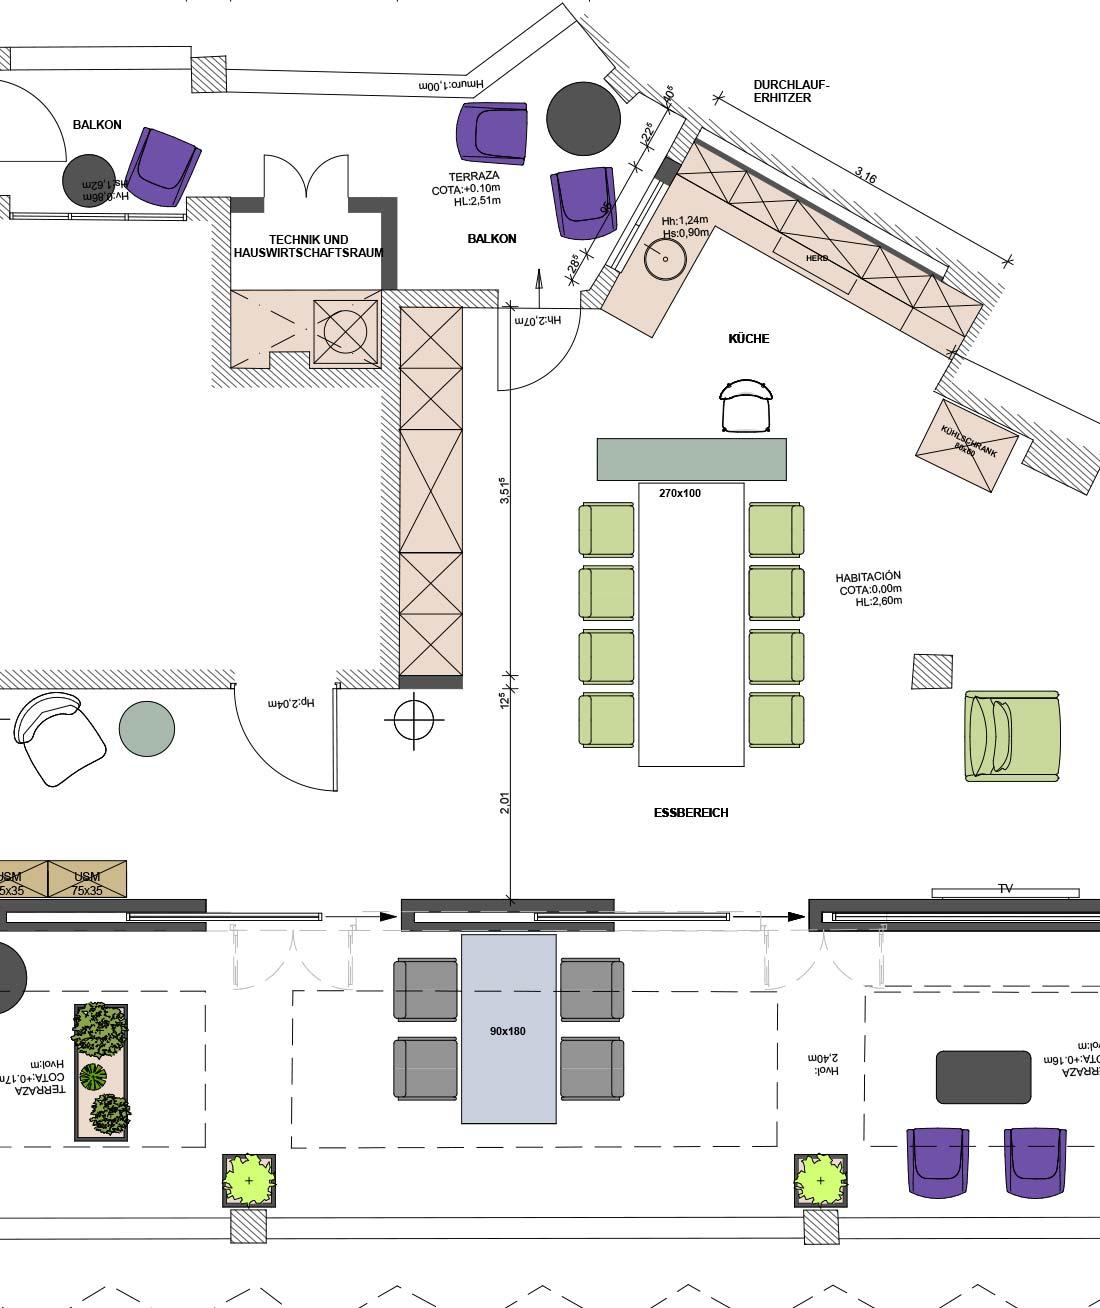 Grundriss Penthouse J. Brücker auf Mallorca